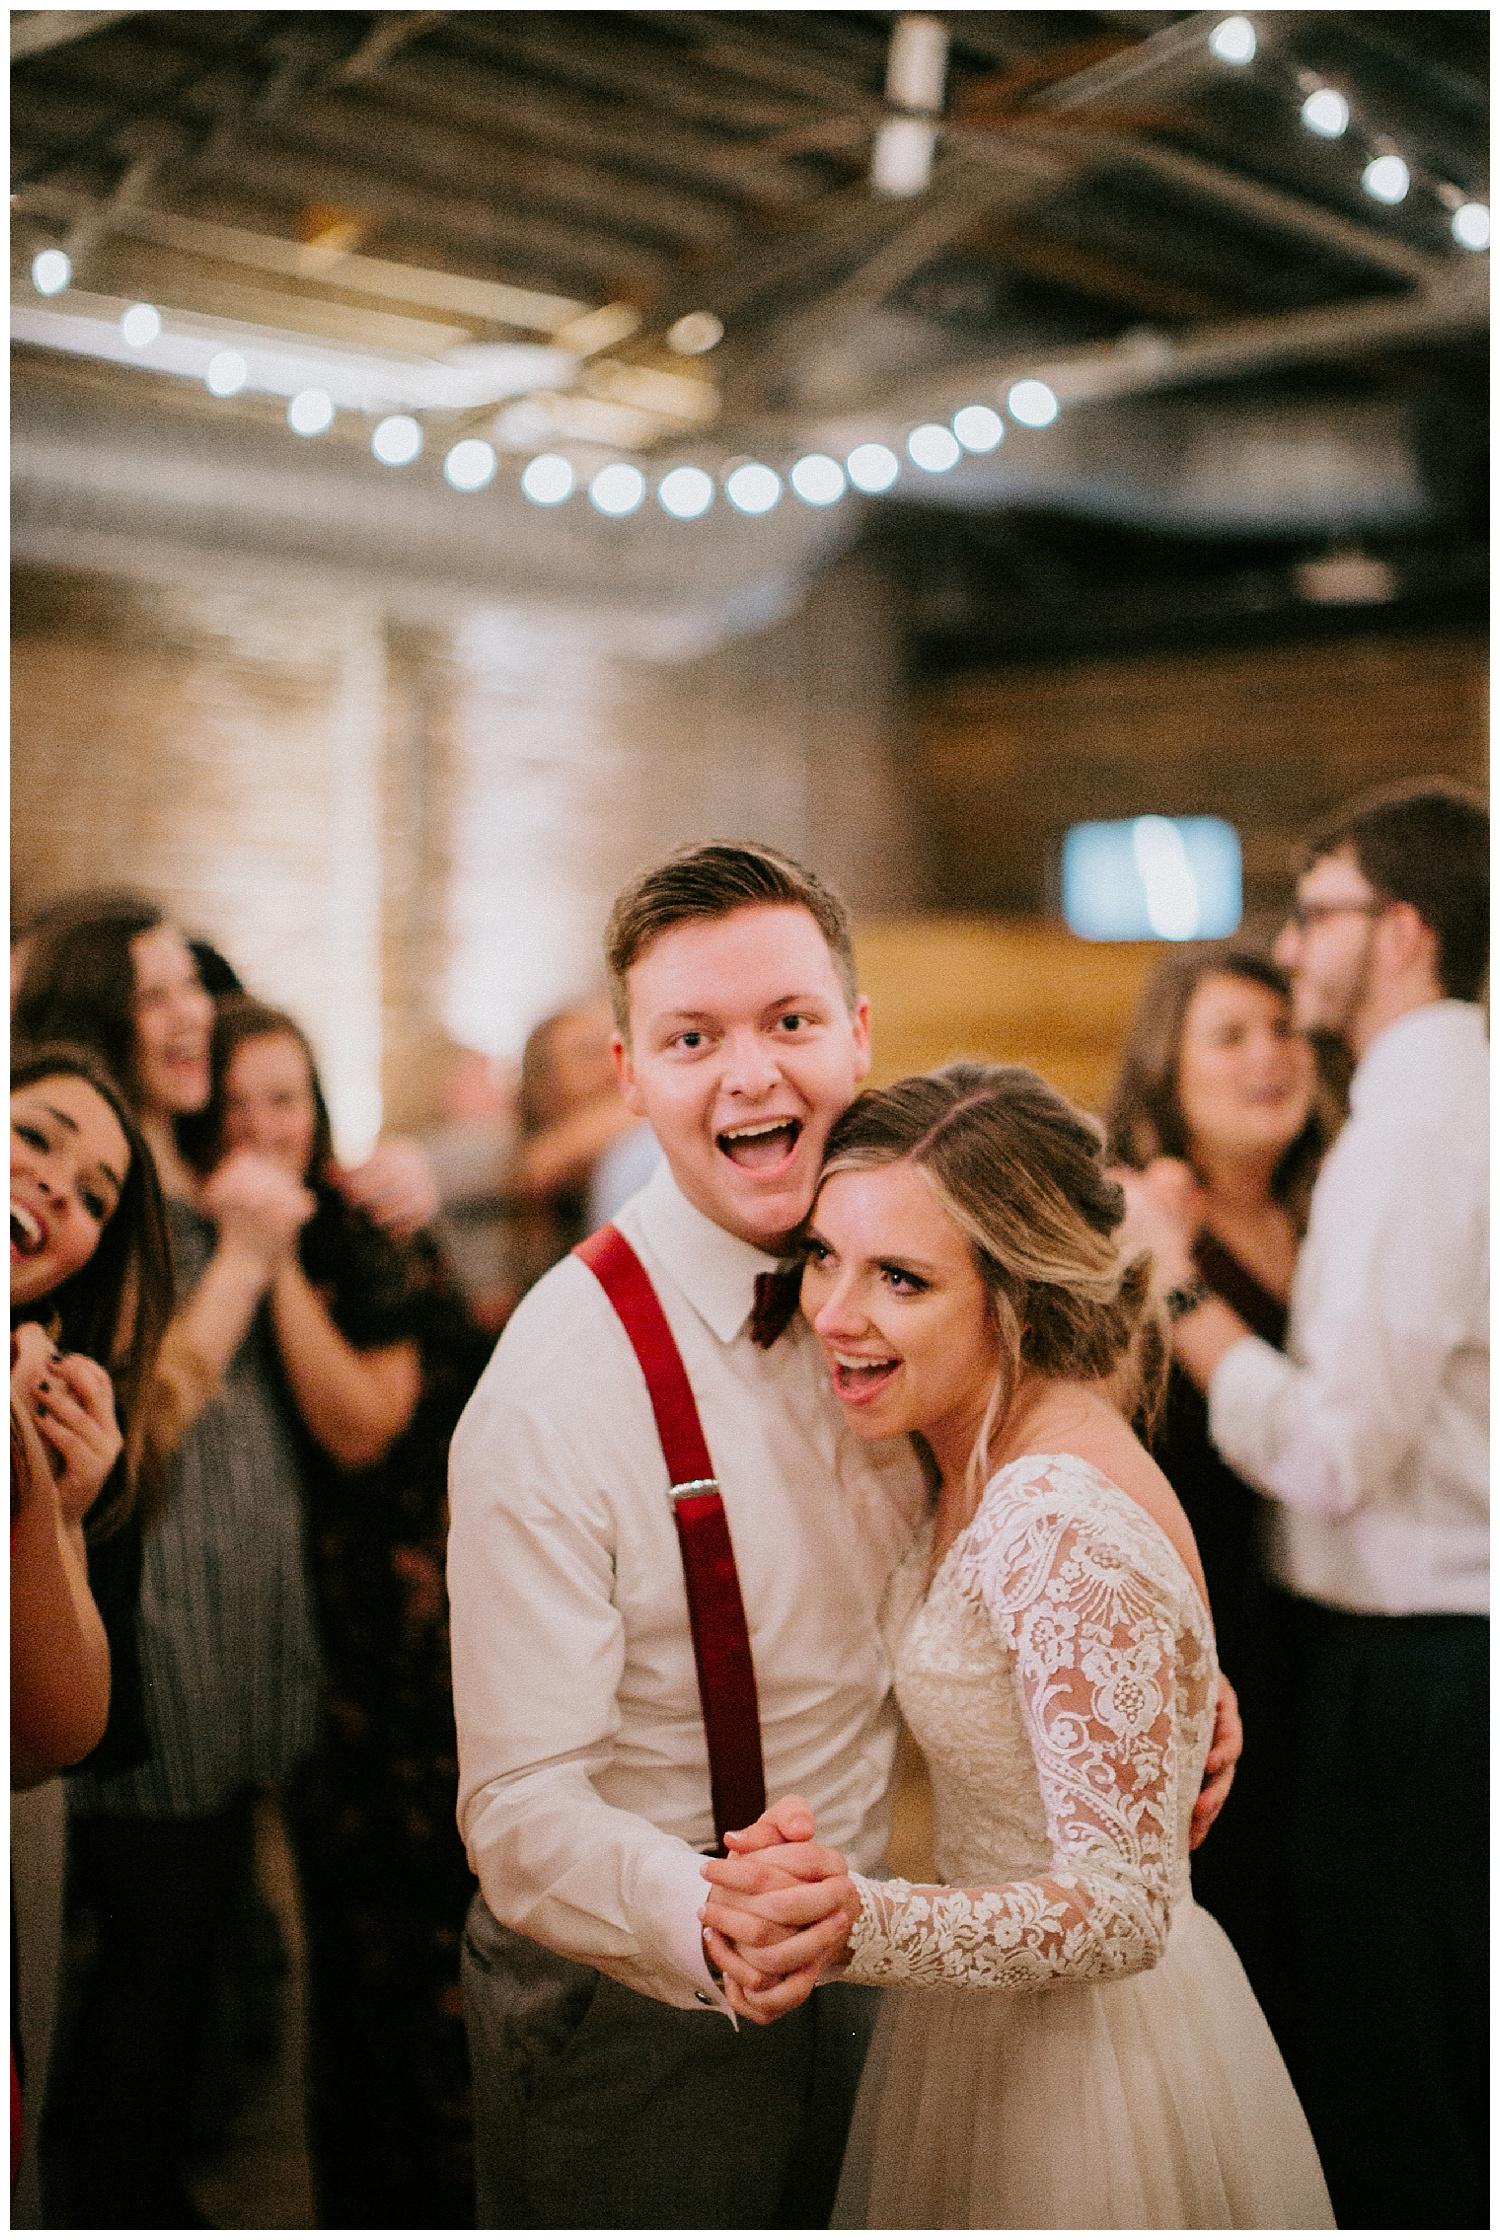 winter-wedding-the standard-knoxville_2019-01-23_0100.jpg